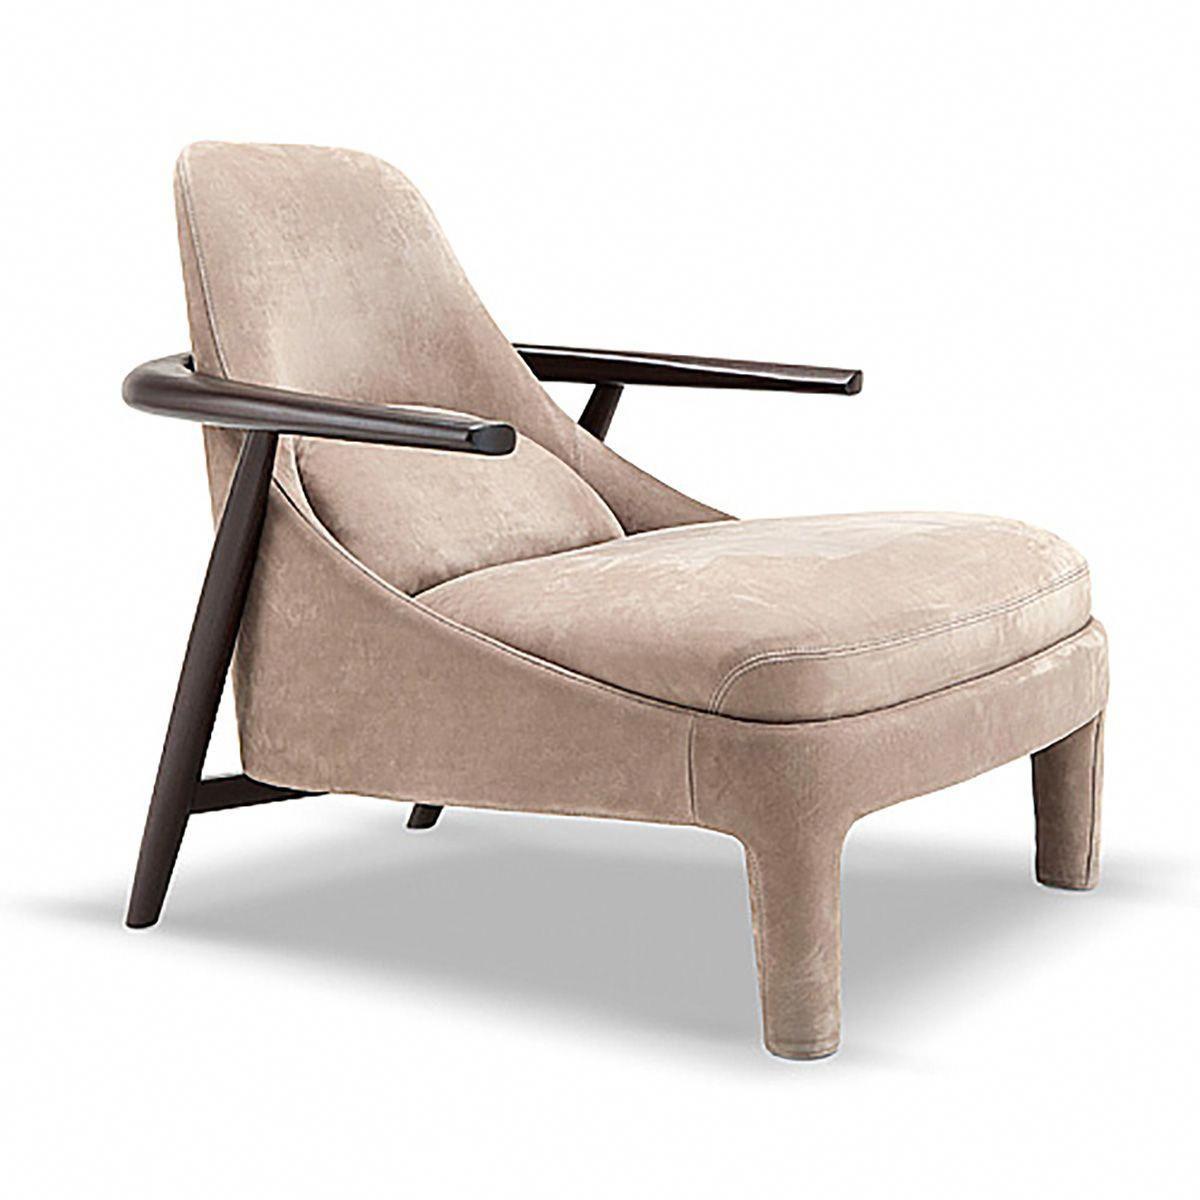 Cheap Discount Furniture Online: Miami Showroom In 2019